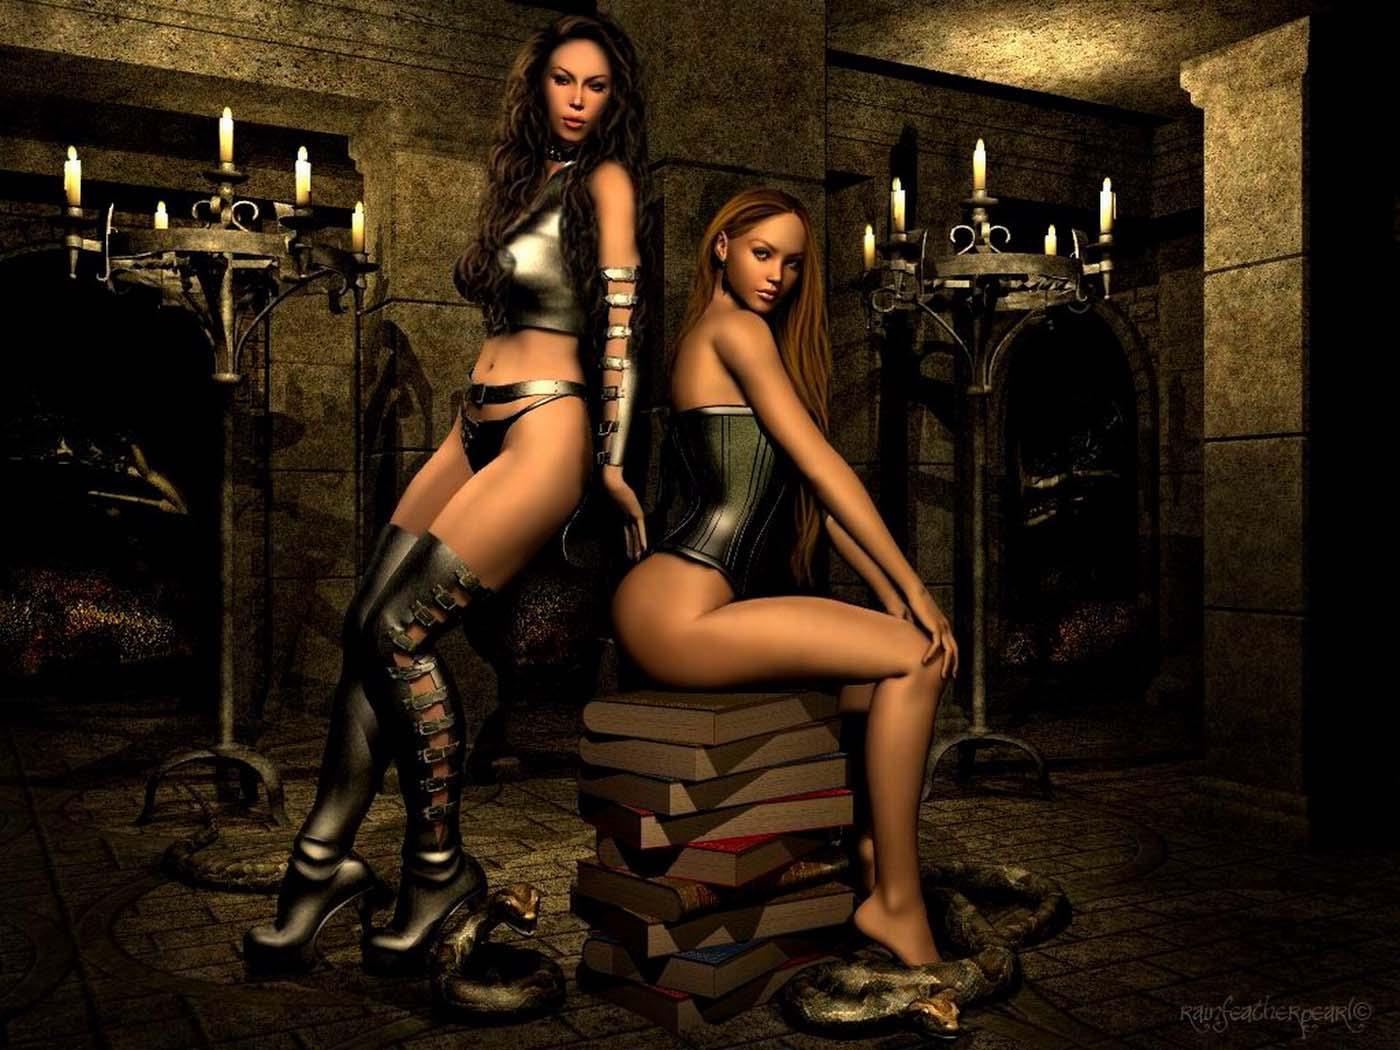 Sucubus snake sex with warrior girl erotica videos